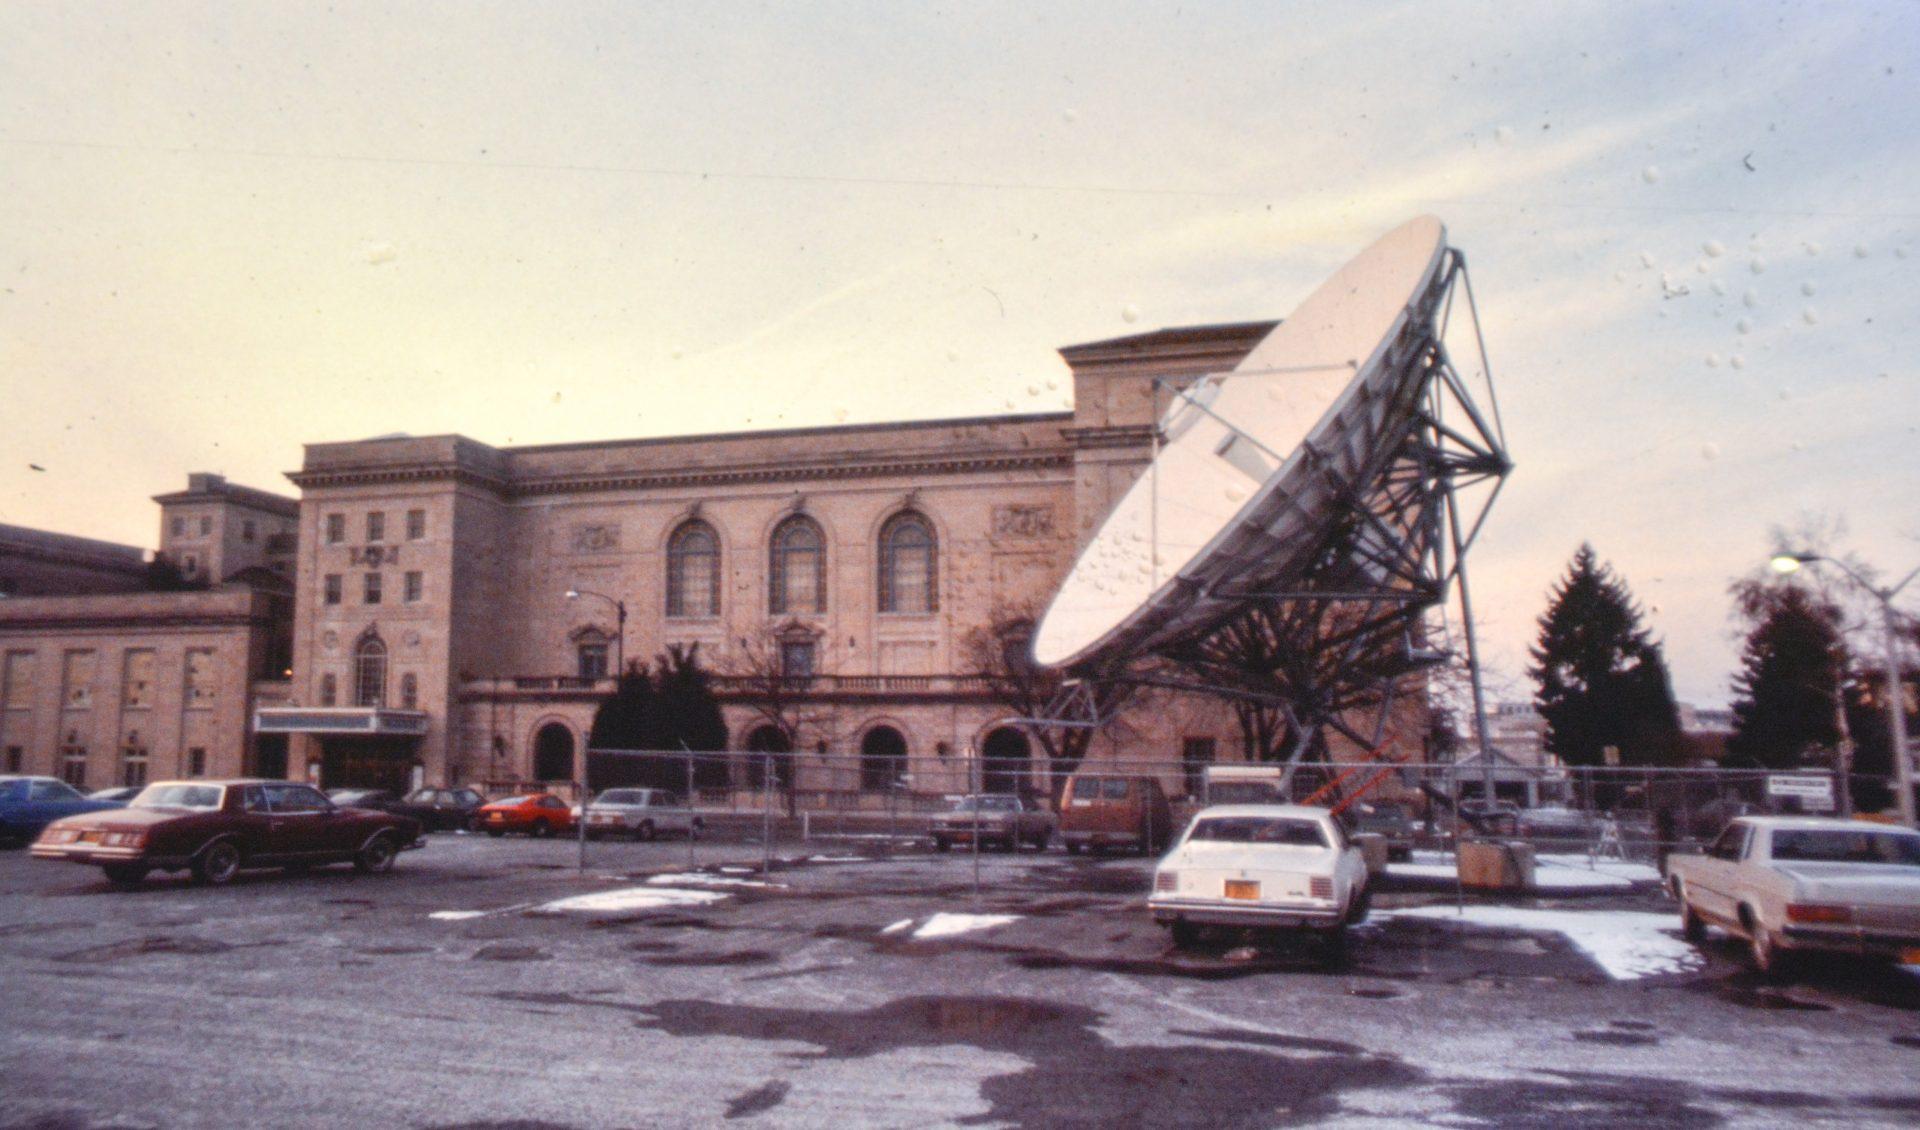 WITF began broadcasting from studios in Hershey.